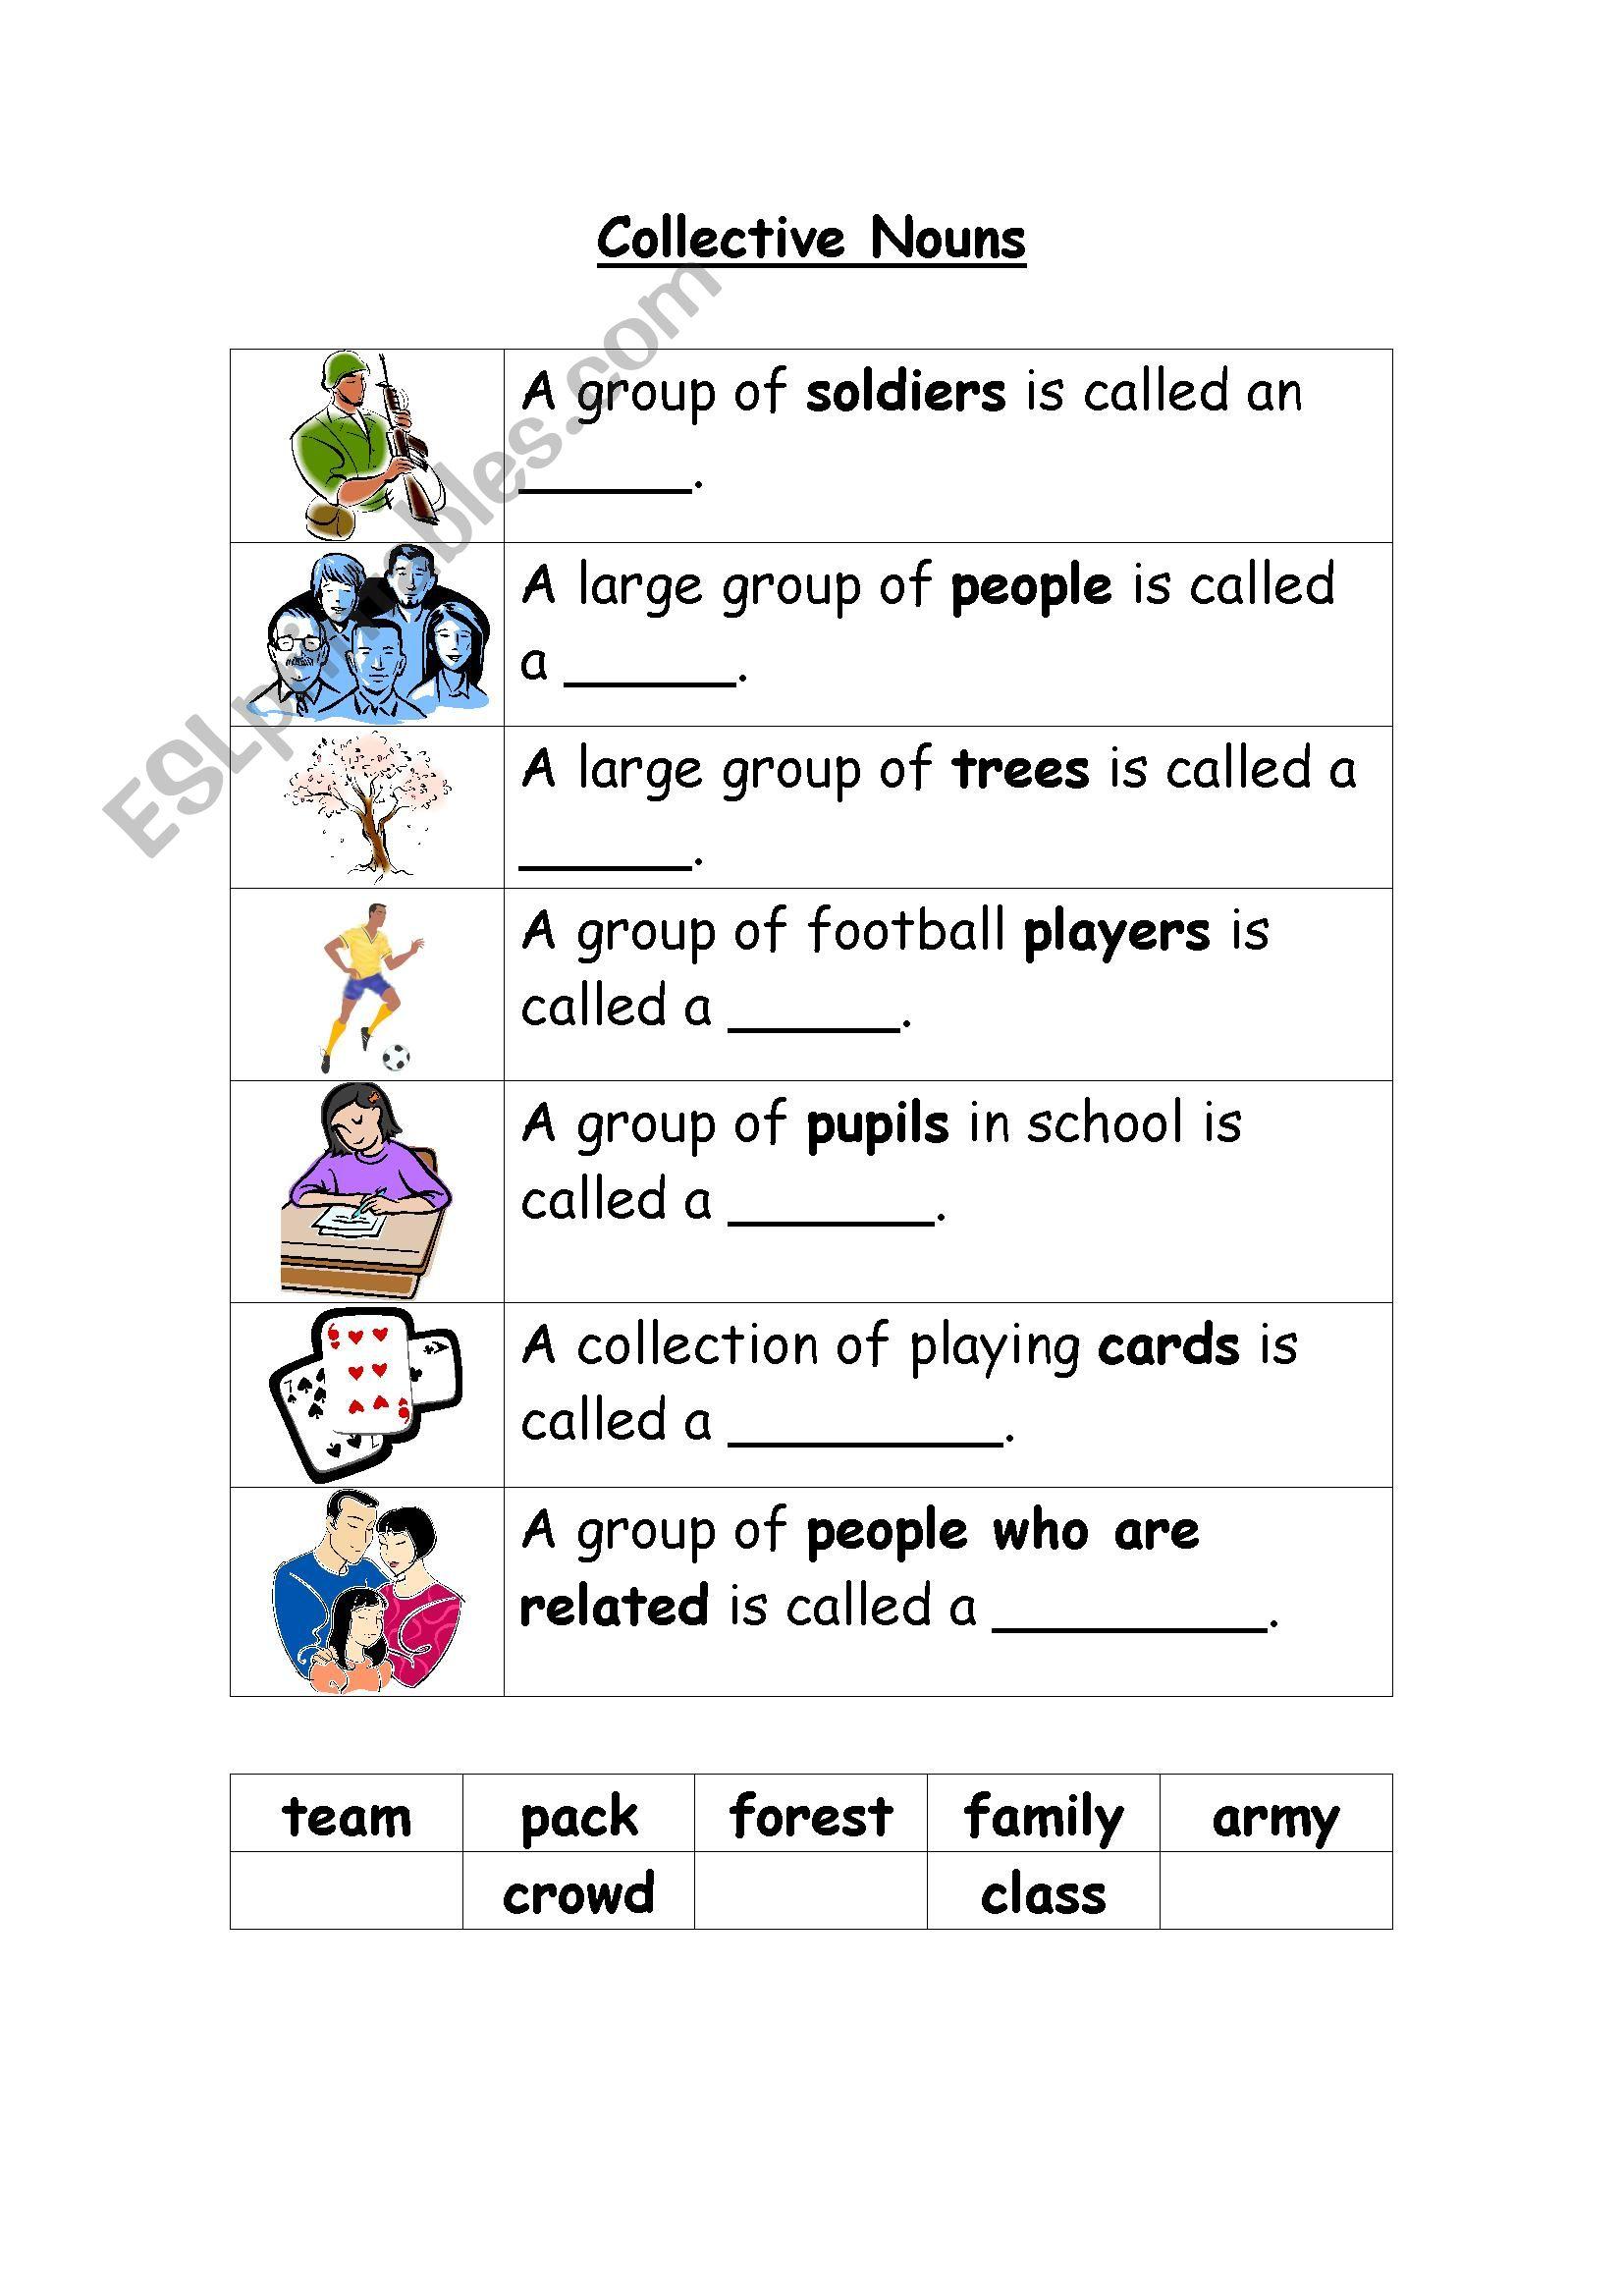 Colletive Nouns